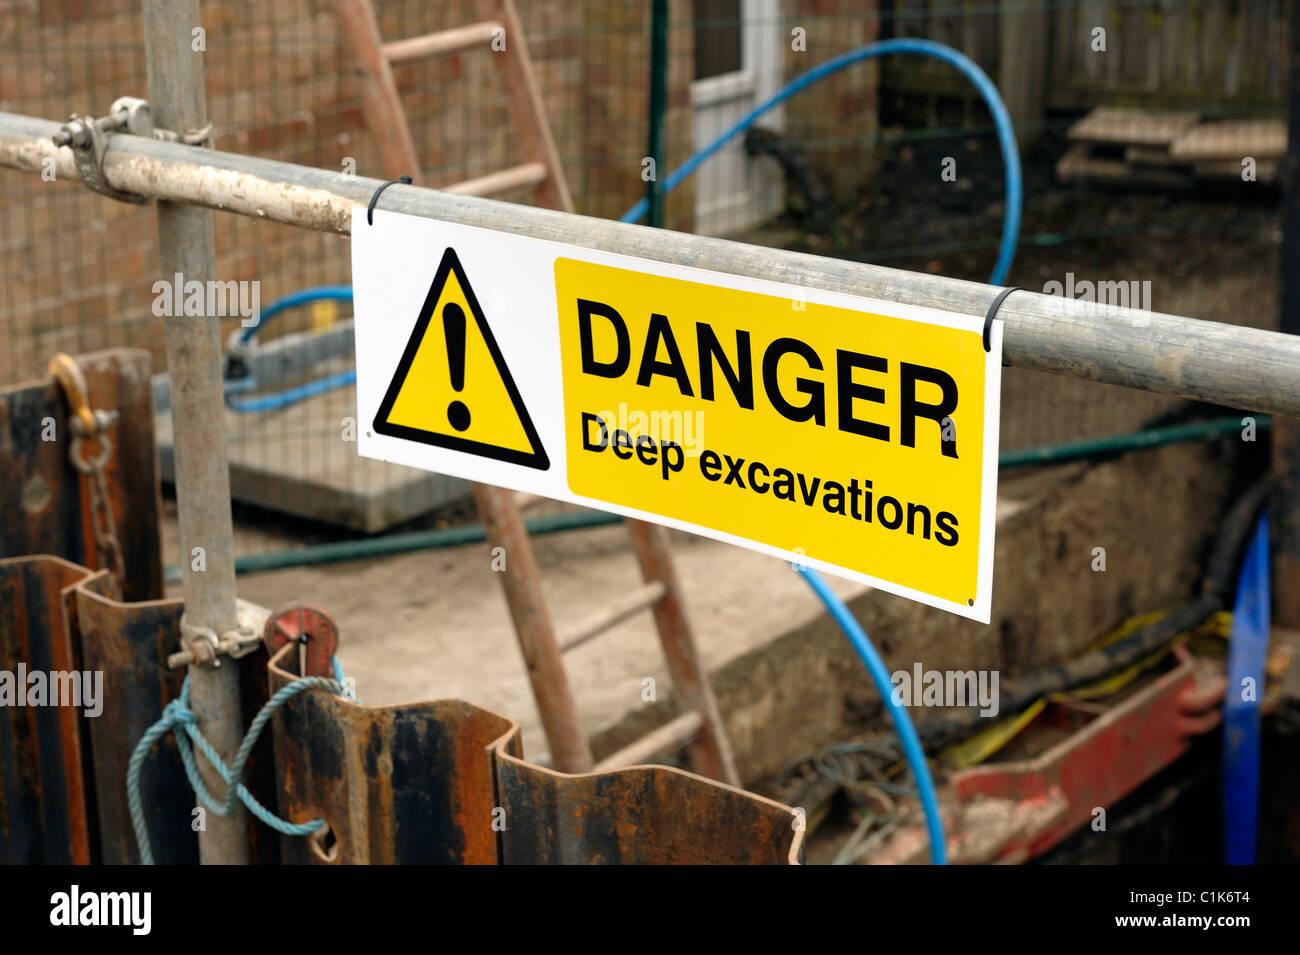 Danger Deep Excavations Warning sign - Stock Image